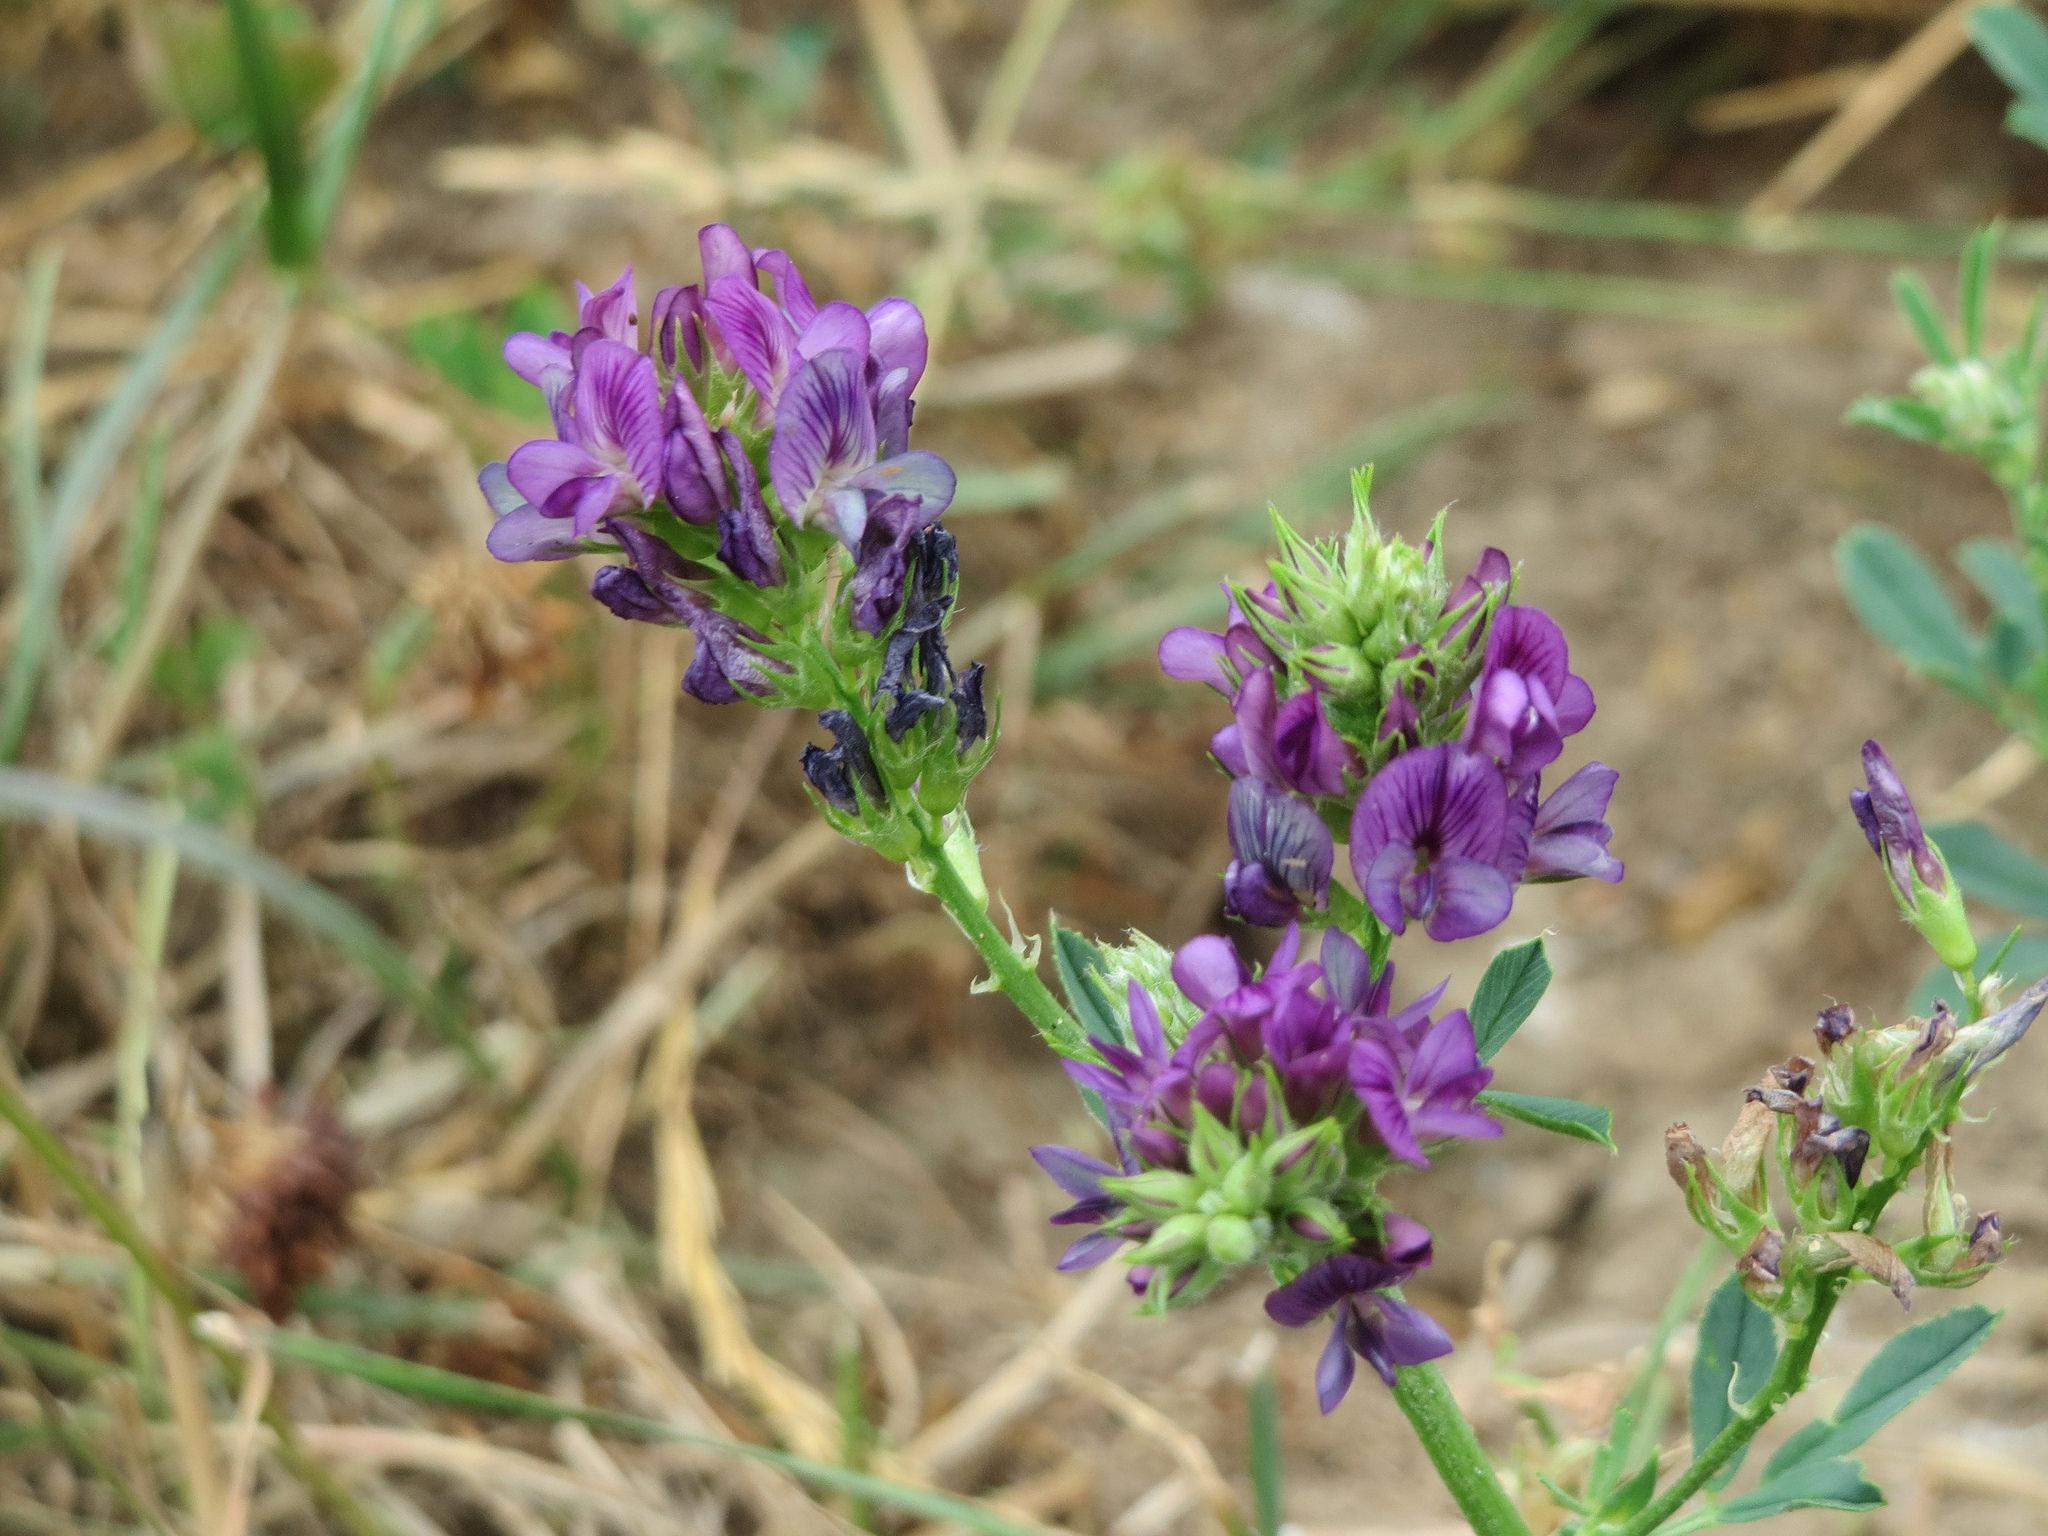 Luzerne semer et planter ooreka for Plante 4 images 1 mot